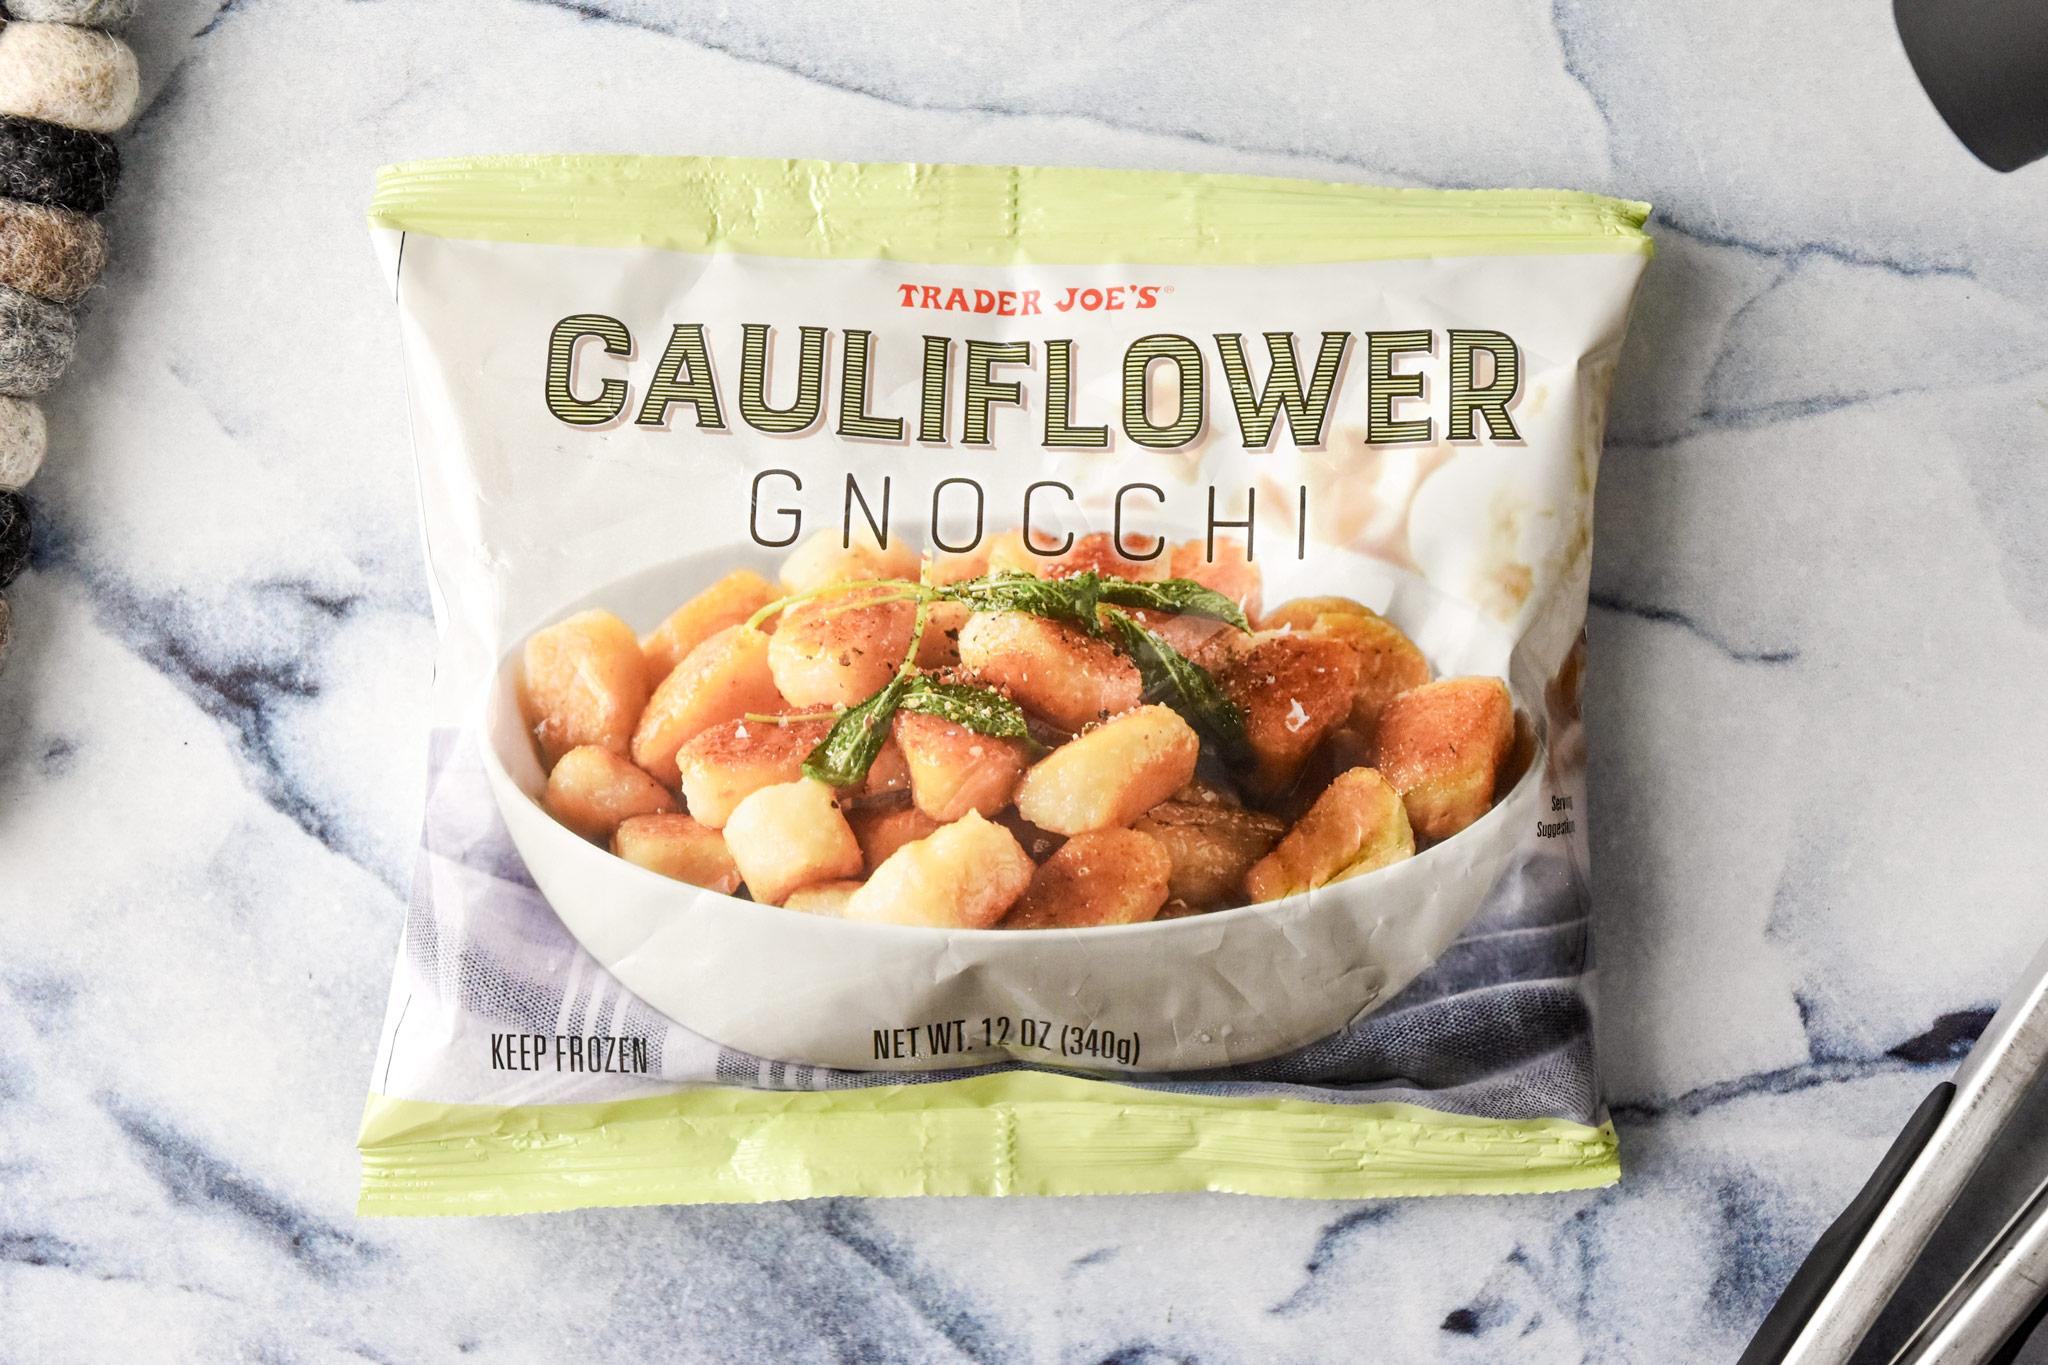 a bag of trader joe's cauliflower gnocchi